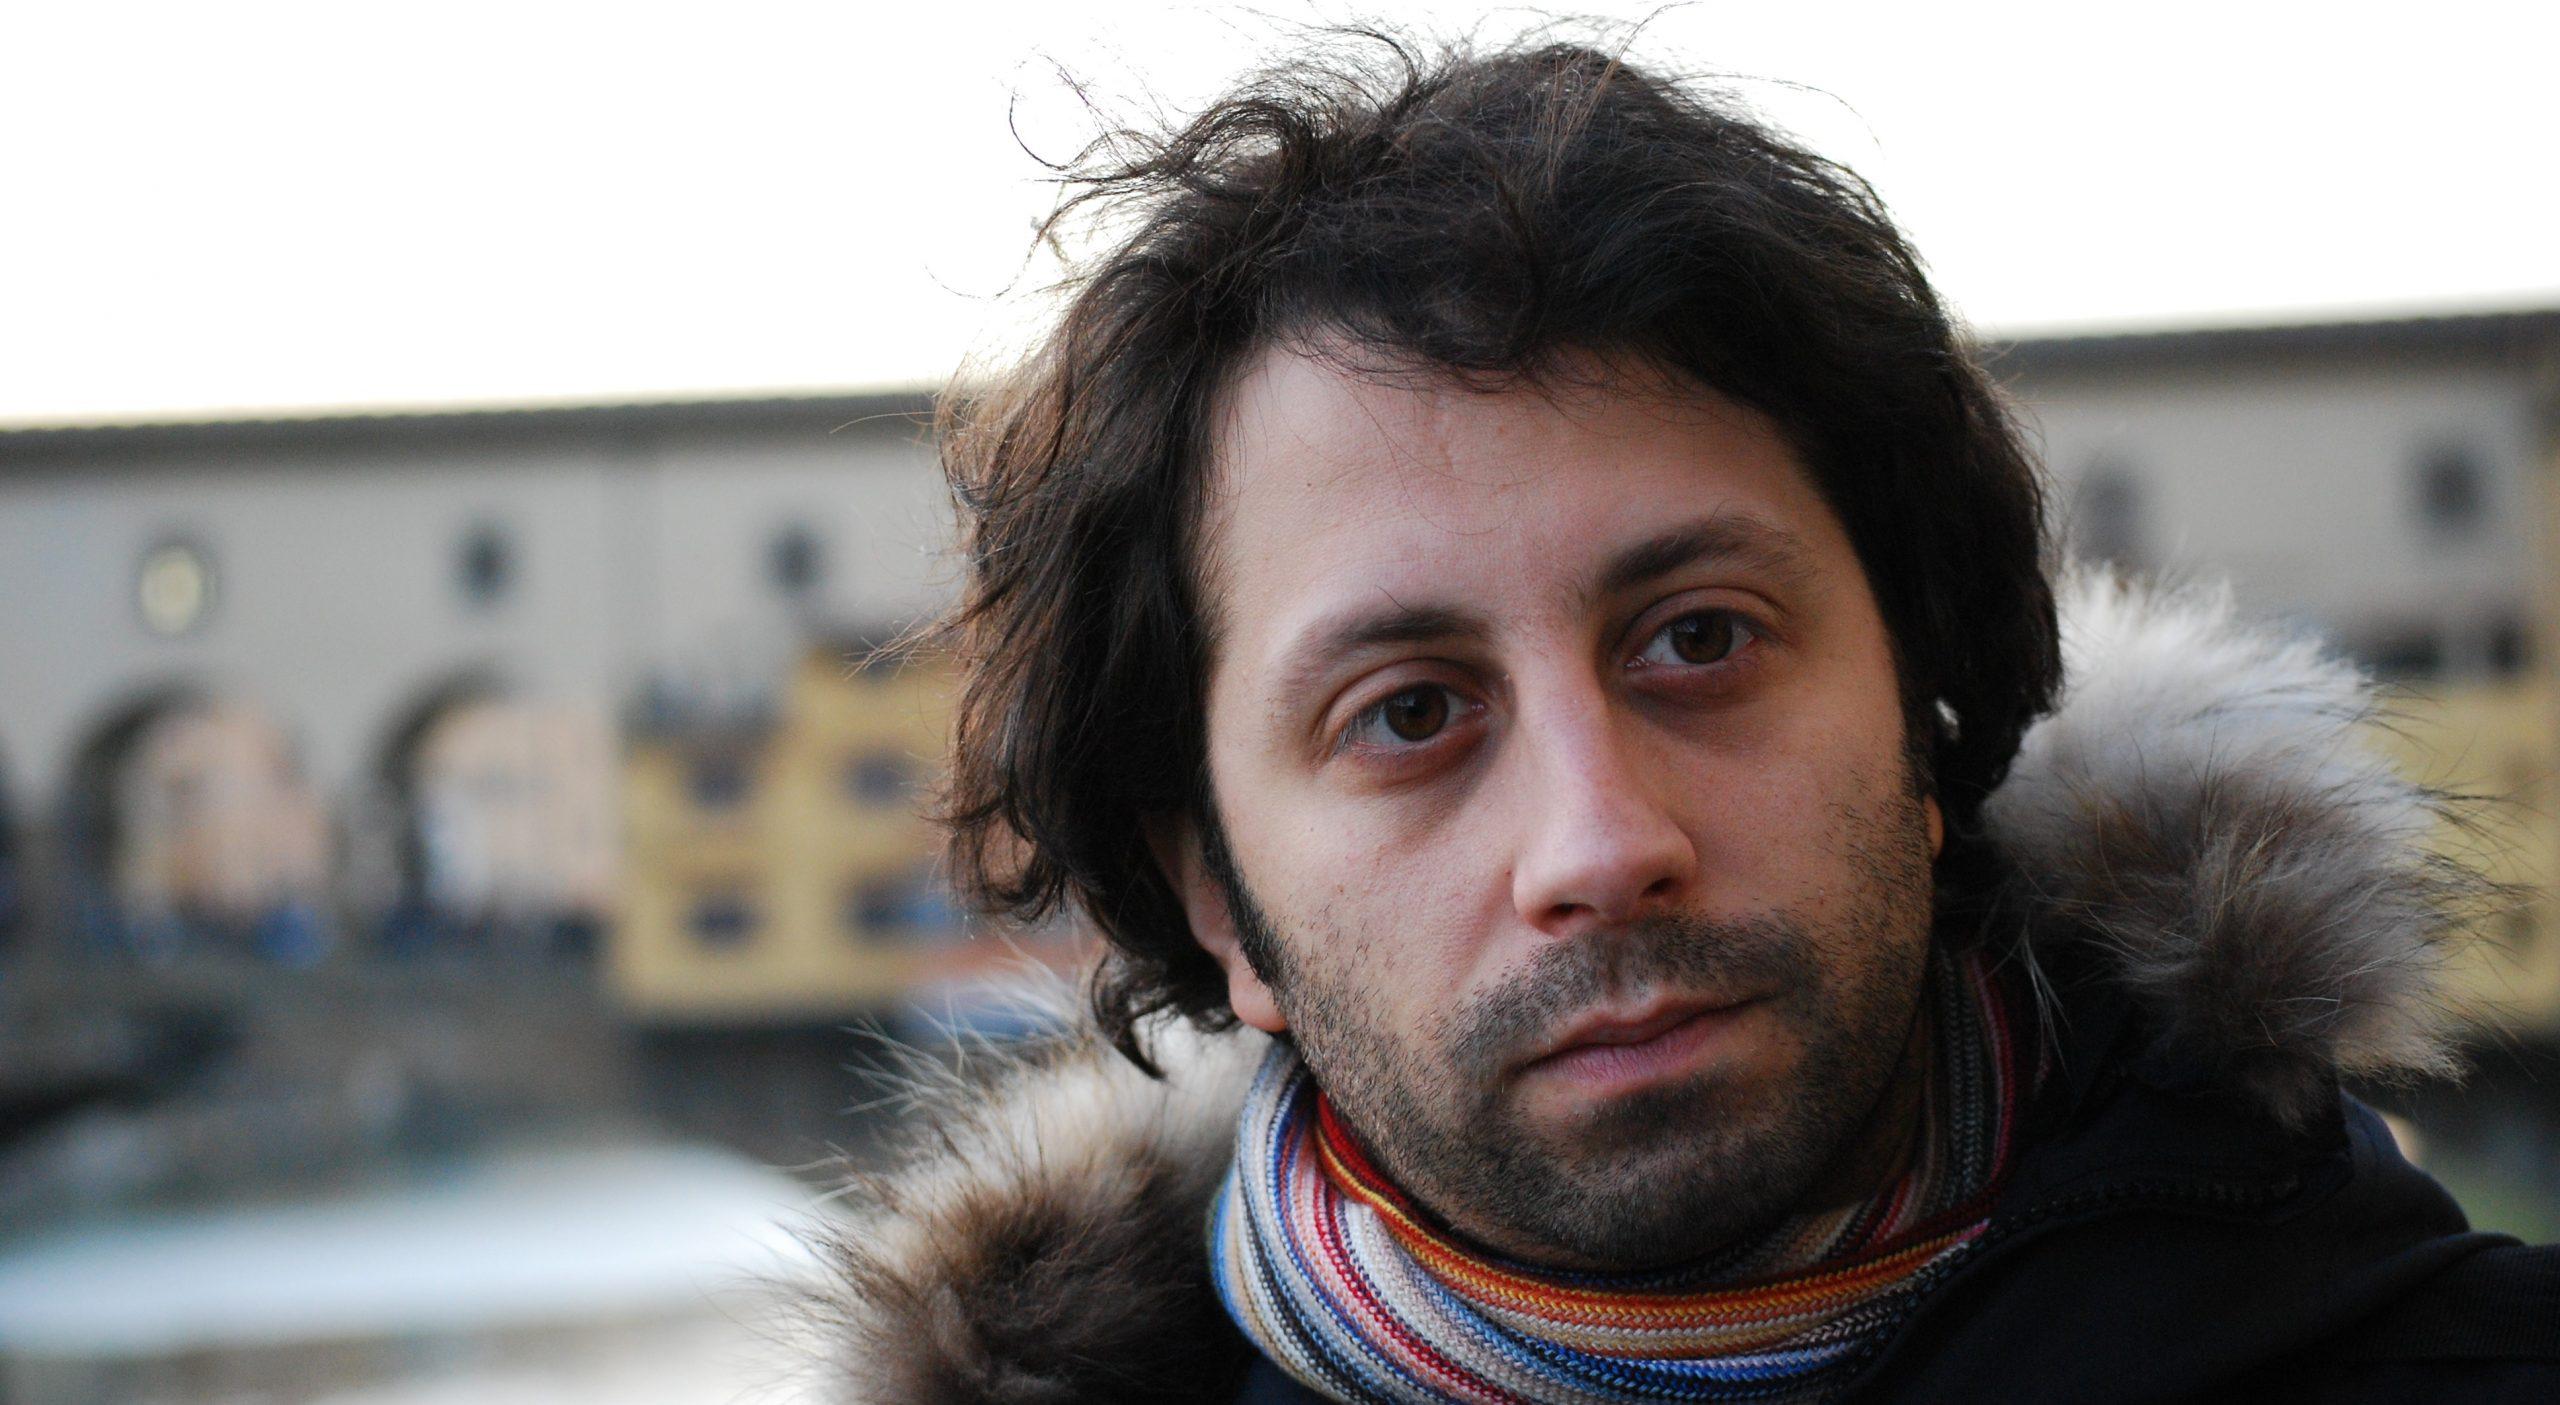 Gianrico Cuppari